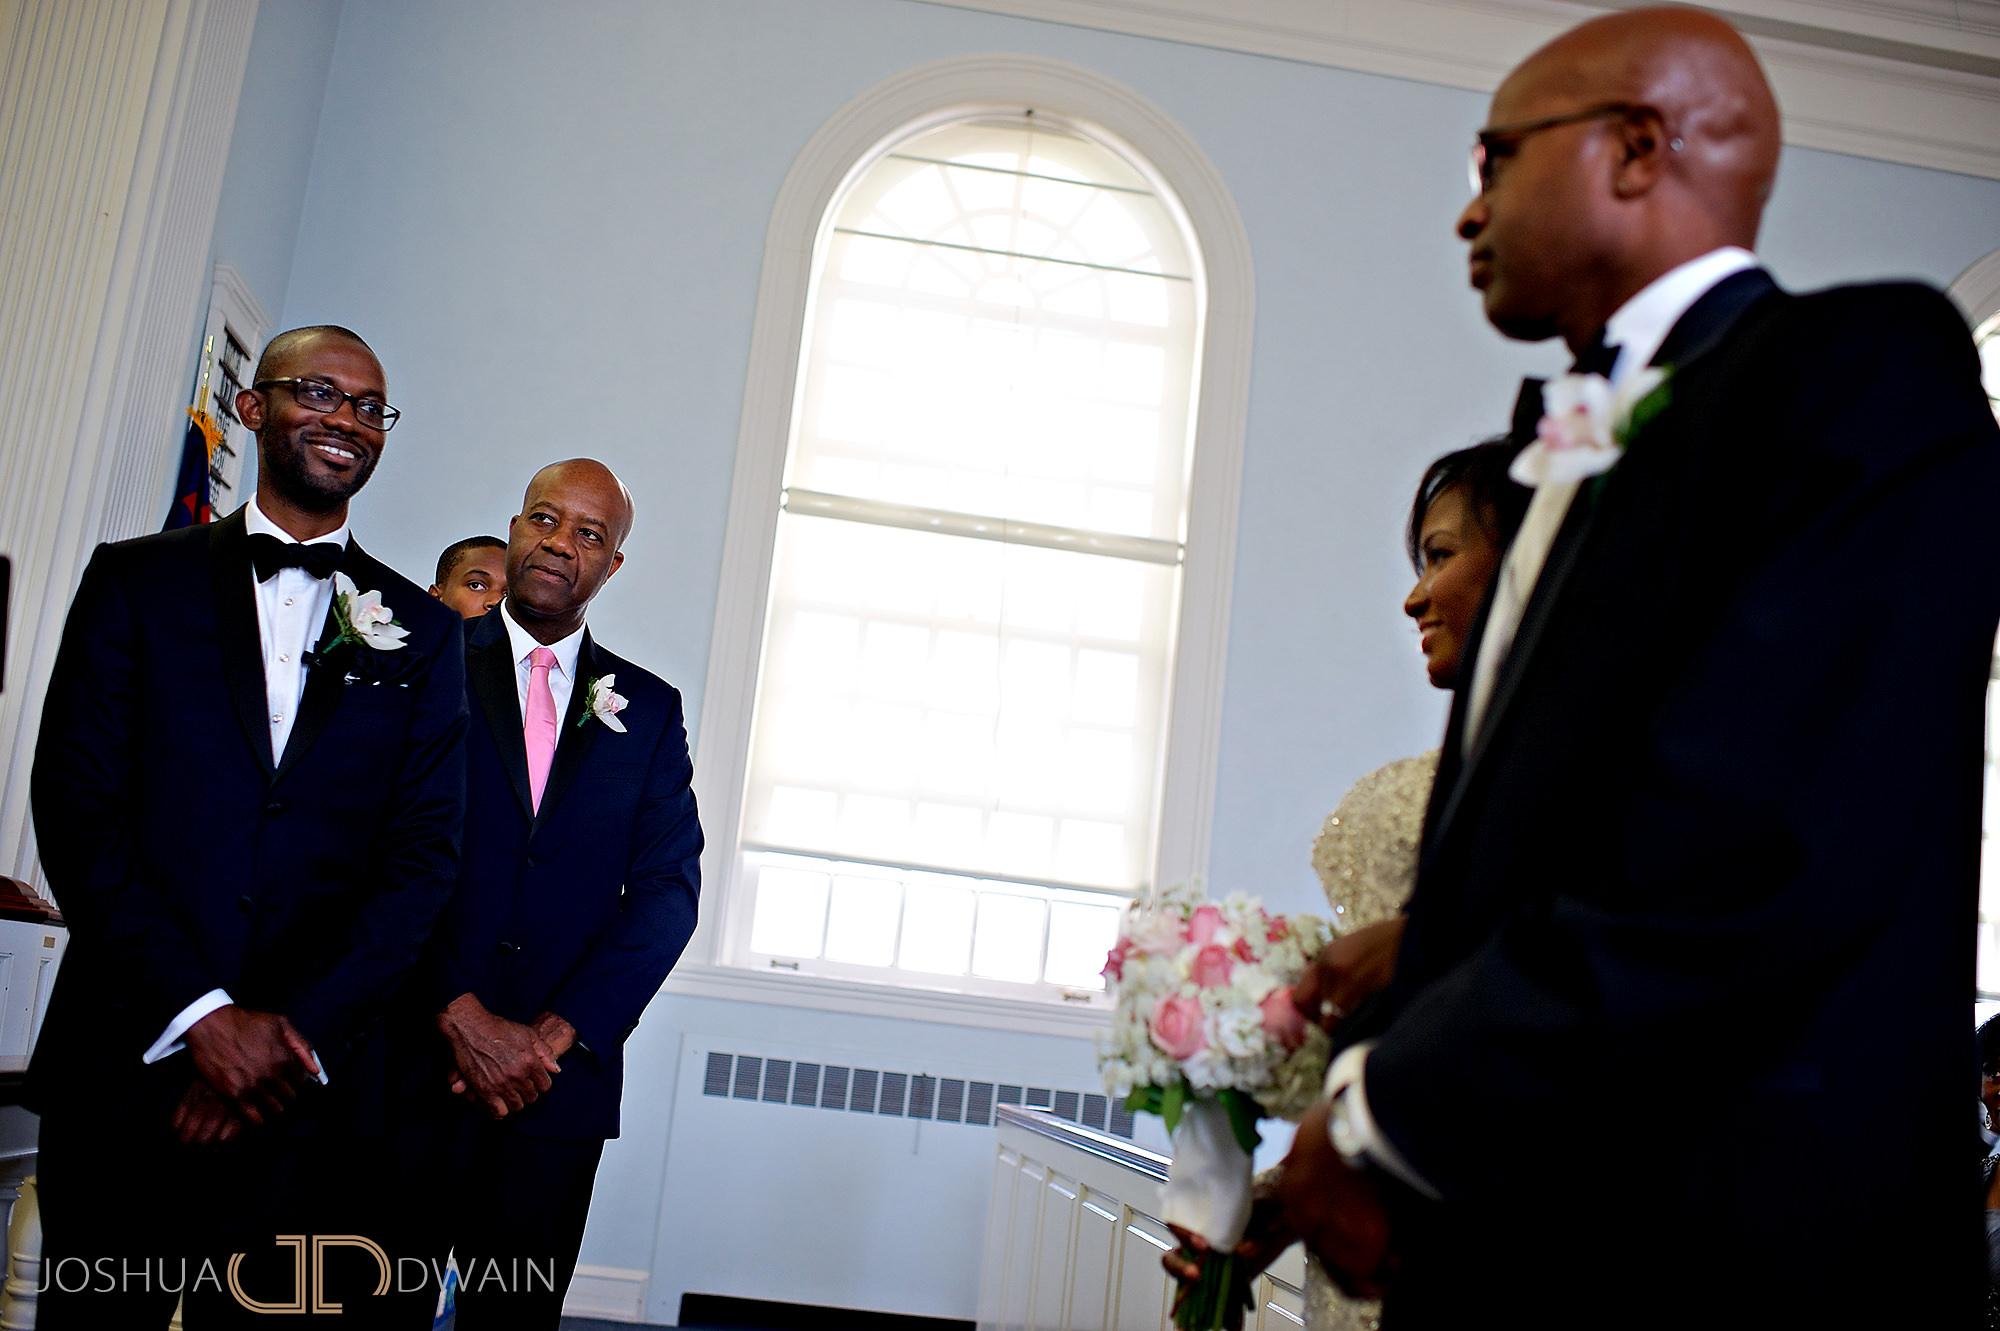 tiffany-udo-004-tendenza-philadelphia-pa-wedding-photographer-joshua-dwain-photography-